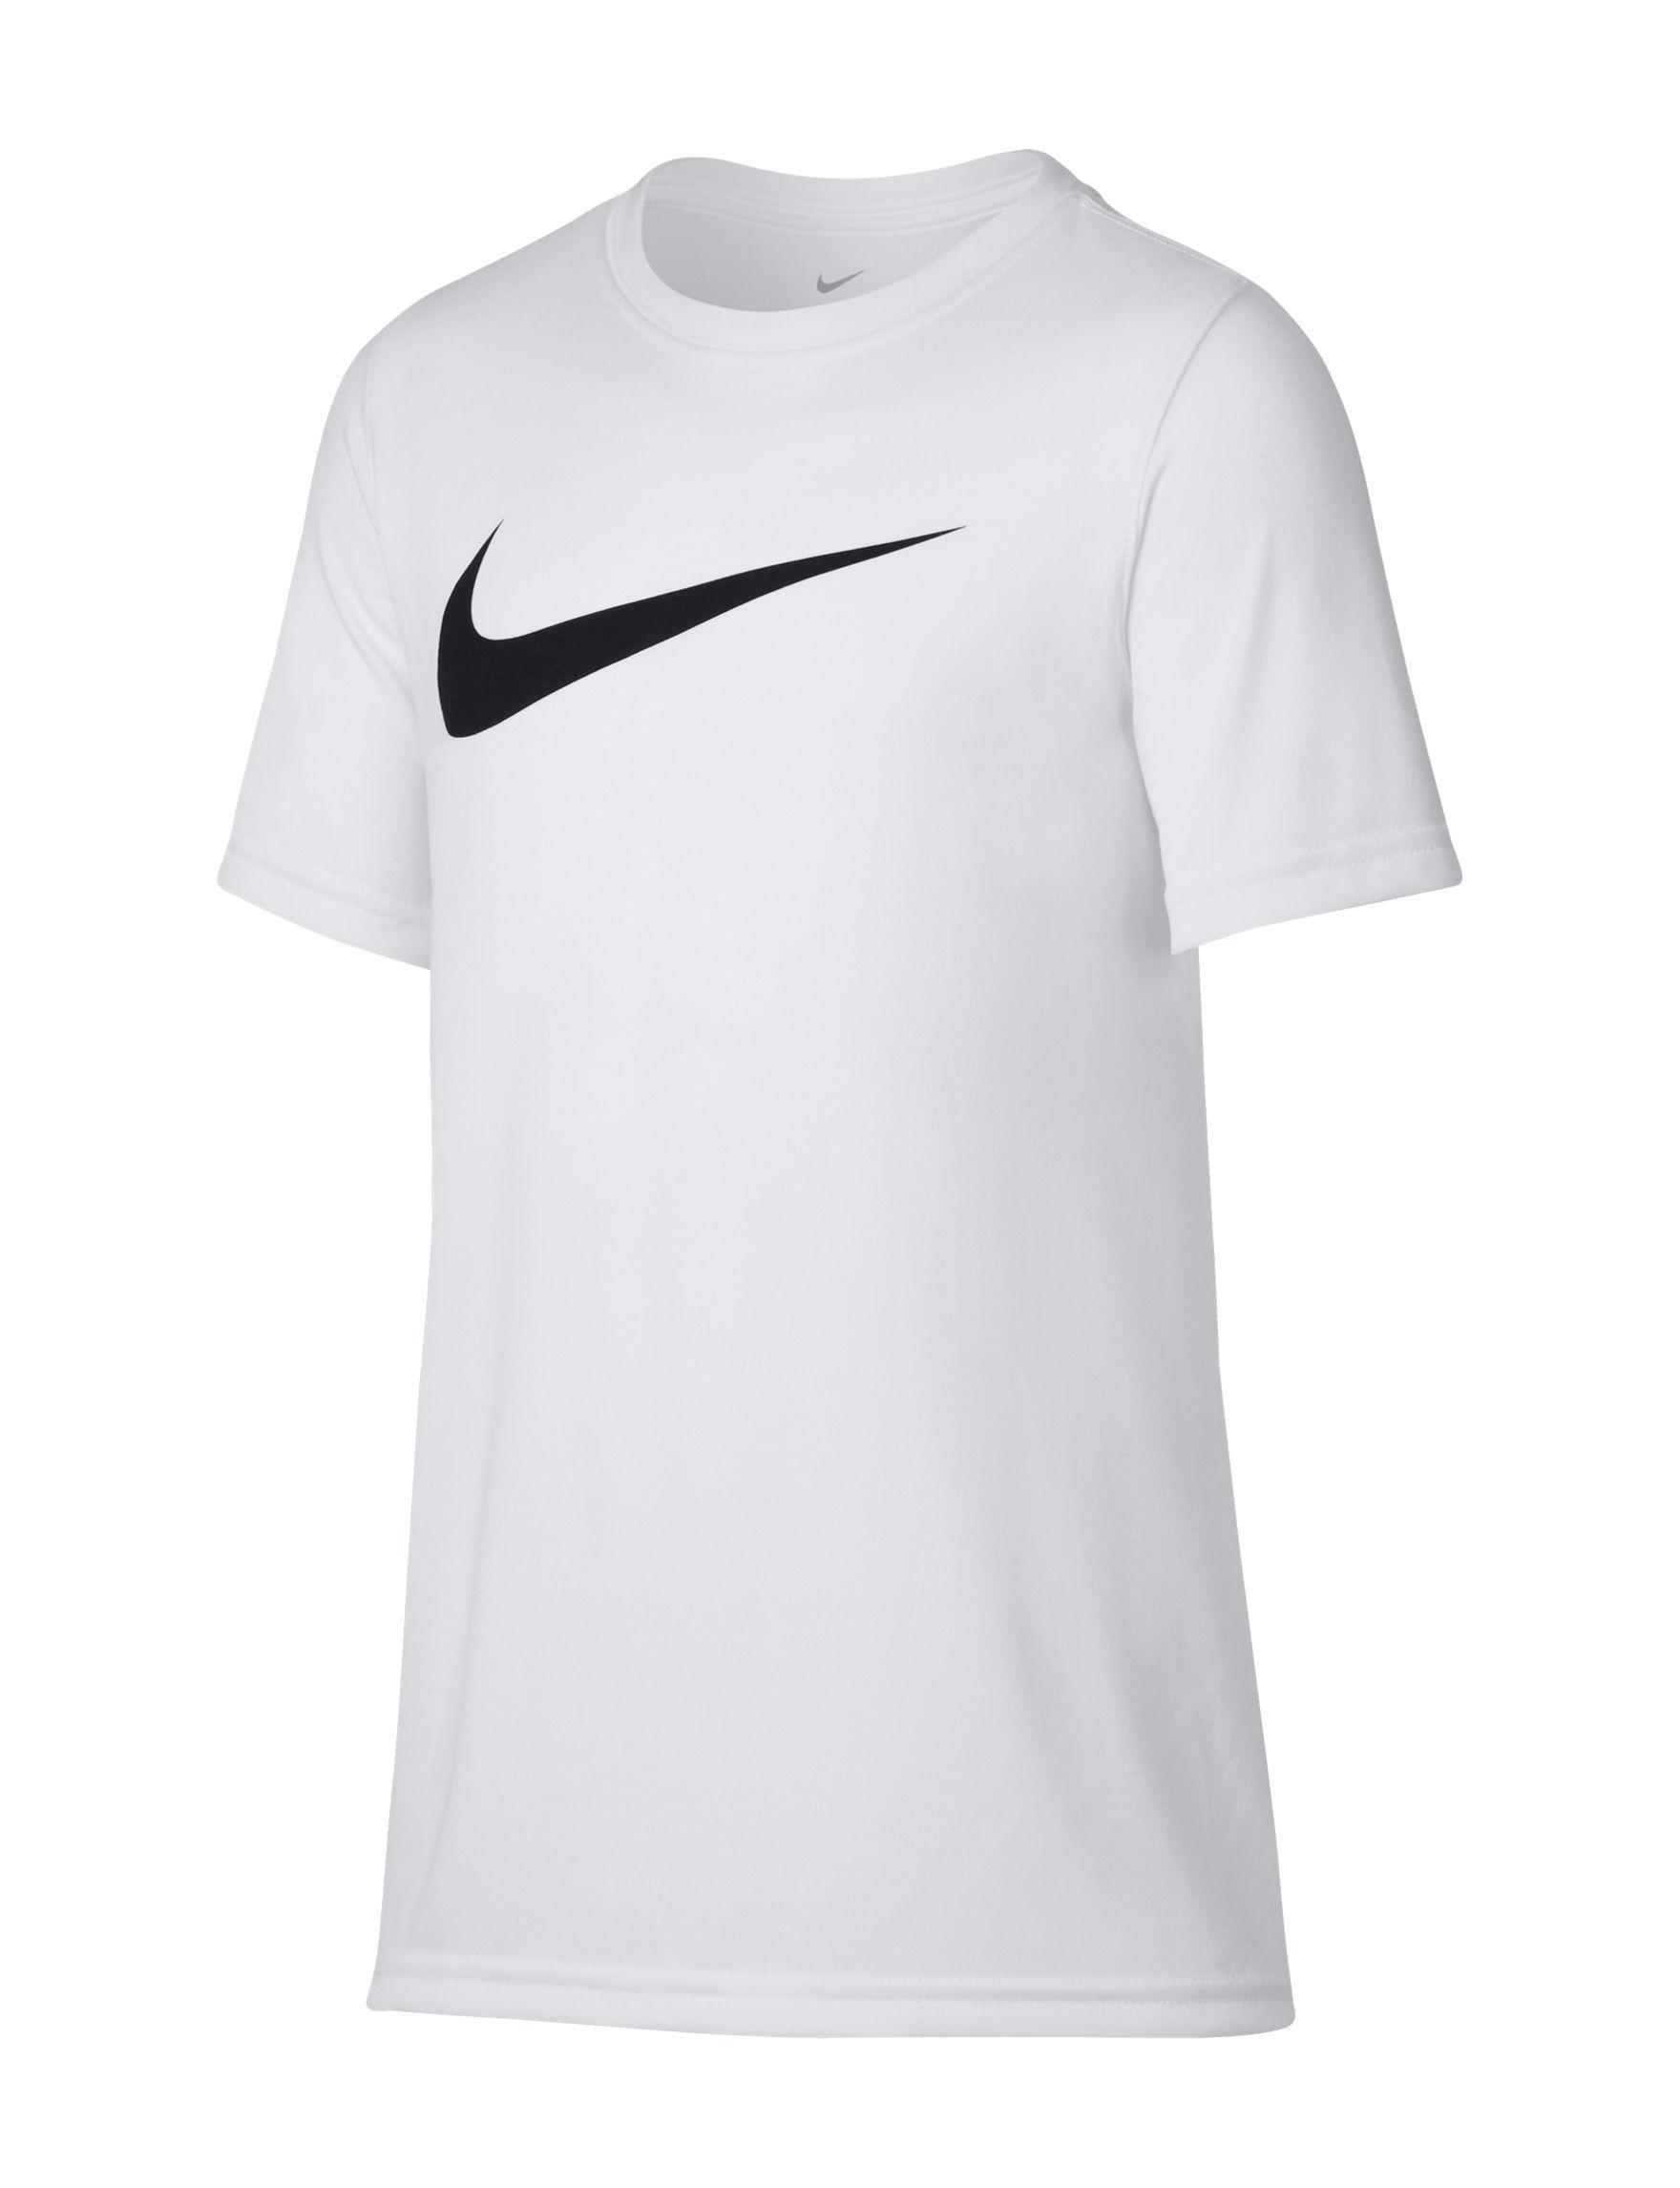 006394c05411f Nike Dri-FIT Swoosh Logo Training T-Shirt - Boys 8-20 | Stage Stores